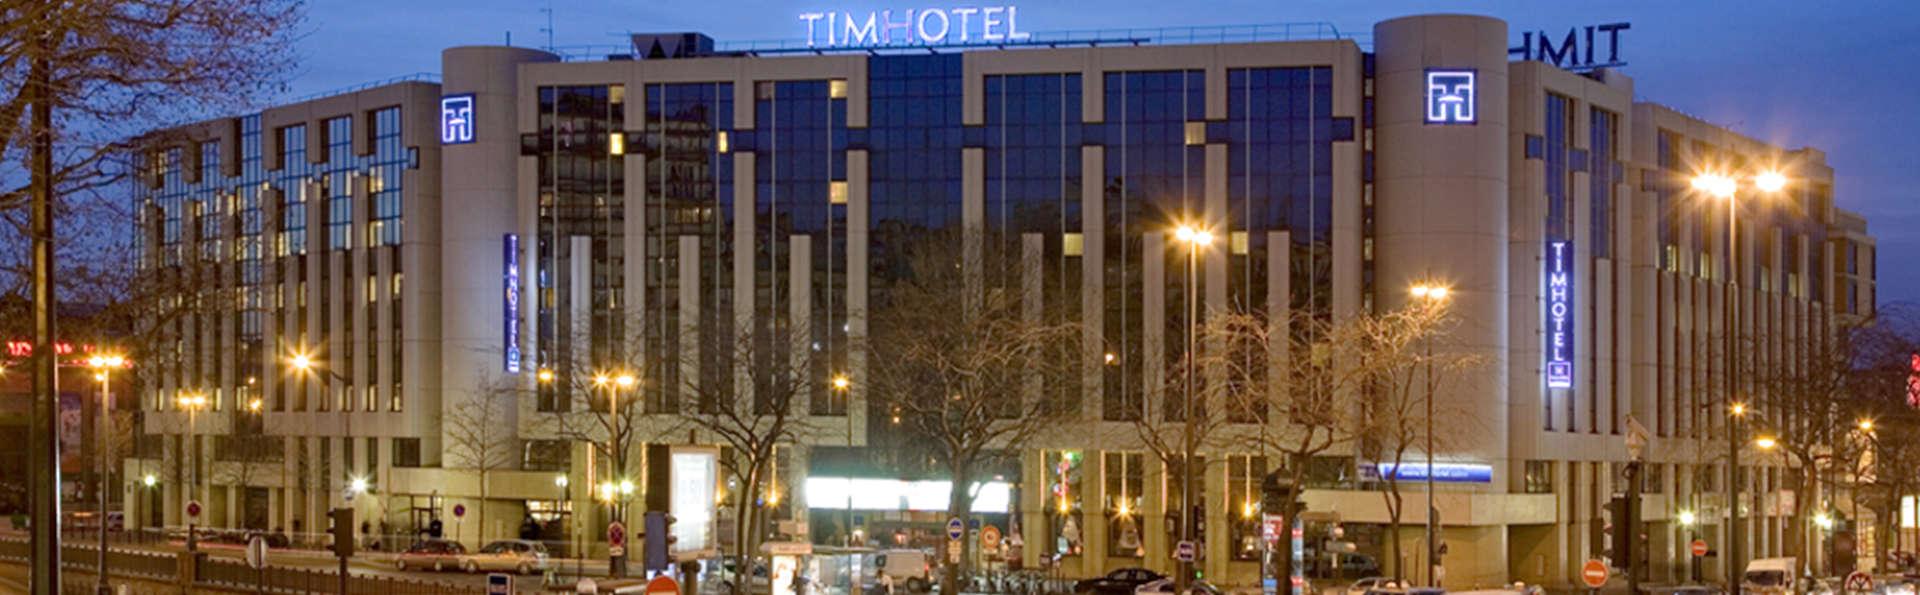 Timh tel bd berthier paris xvii me charmehotel parijs - Hotel timhotel porte de clichy ...